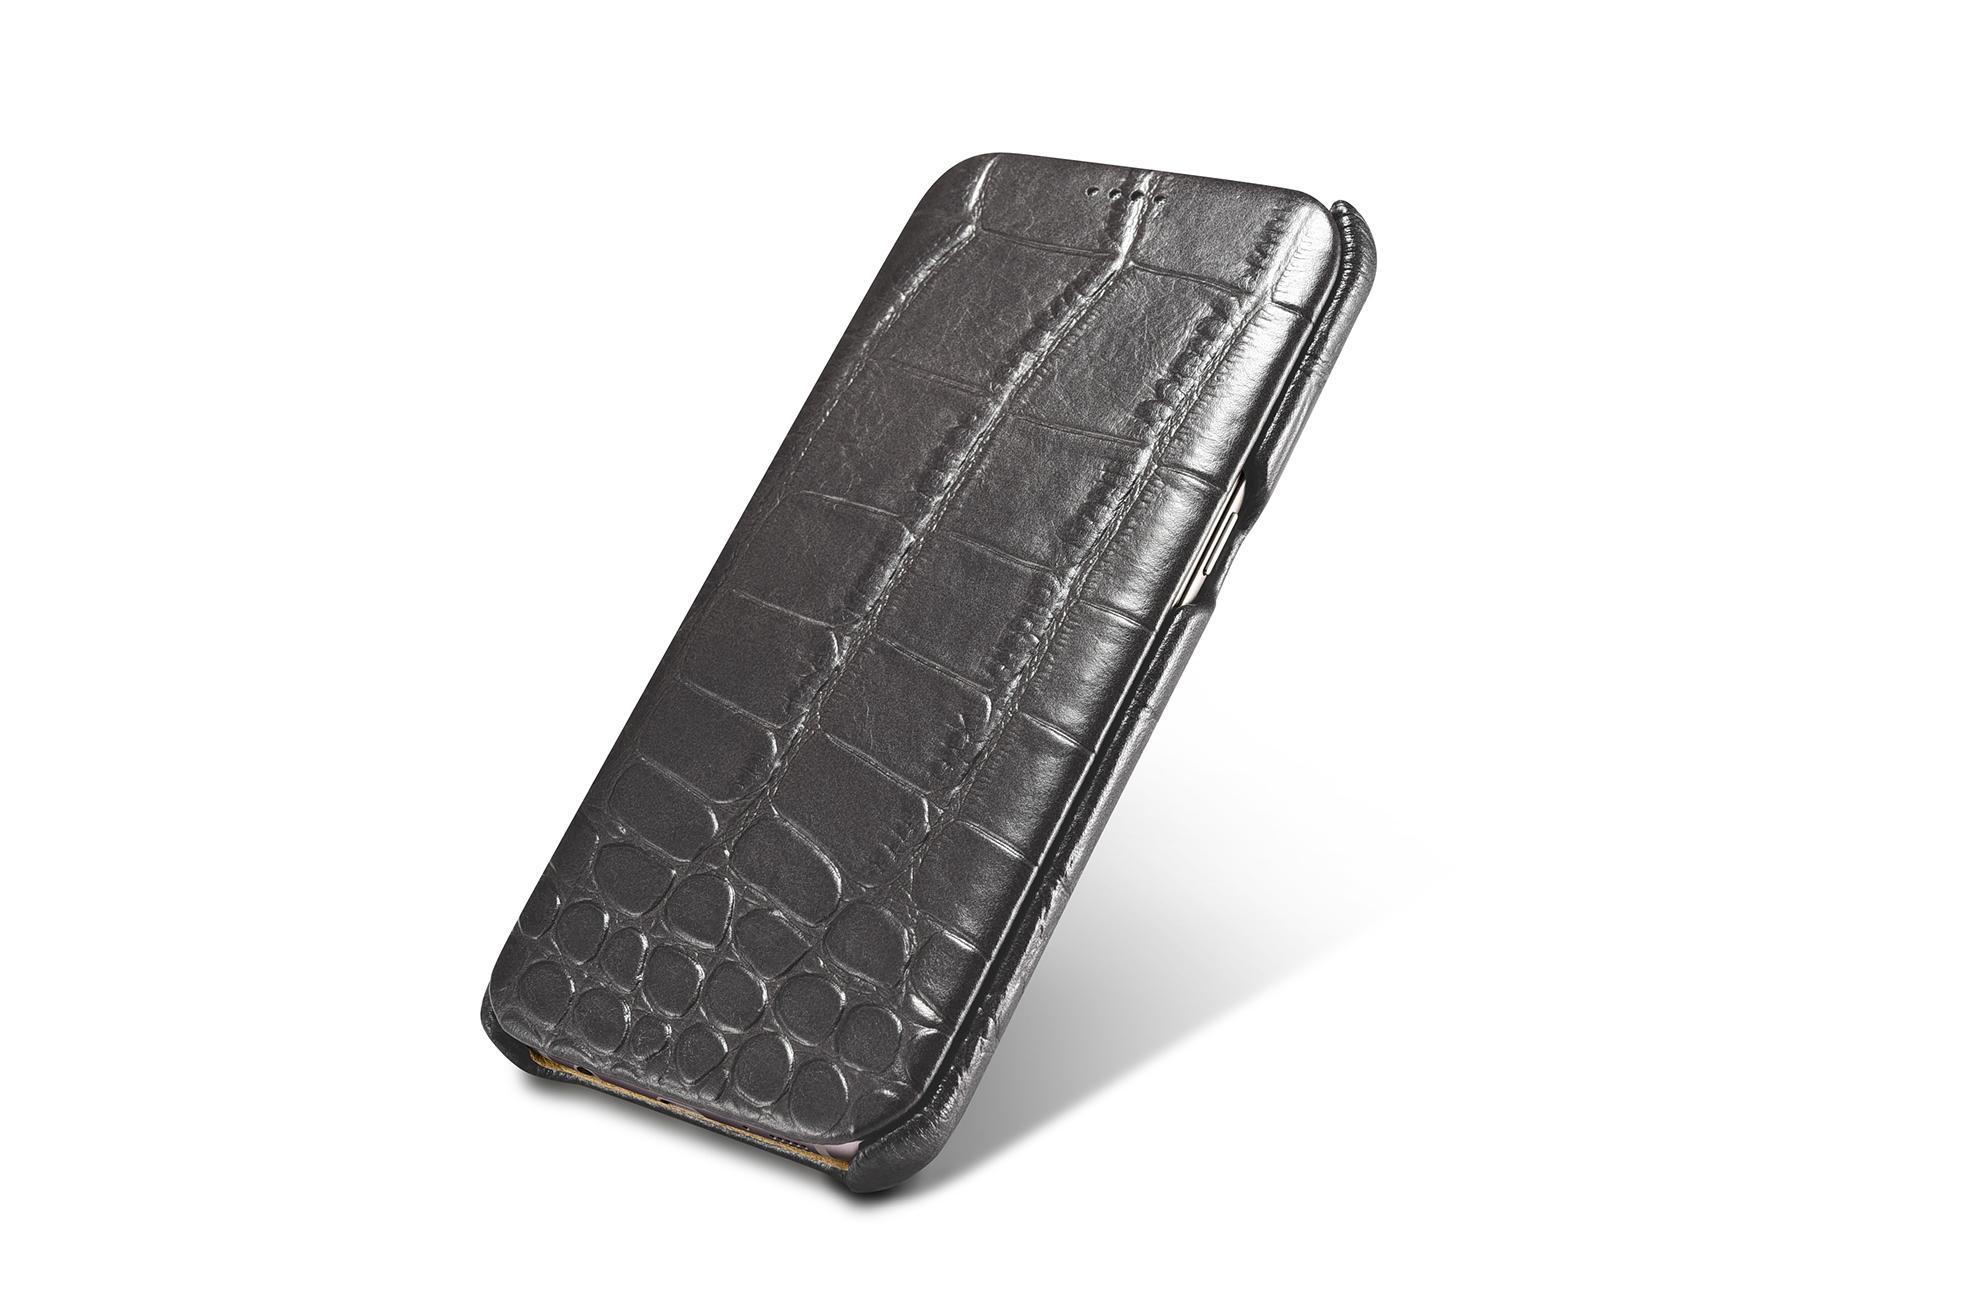 iCarer Samsung Galaxy S7 Edge Embossed Crocodile Genuine Leather Folio Case 2